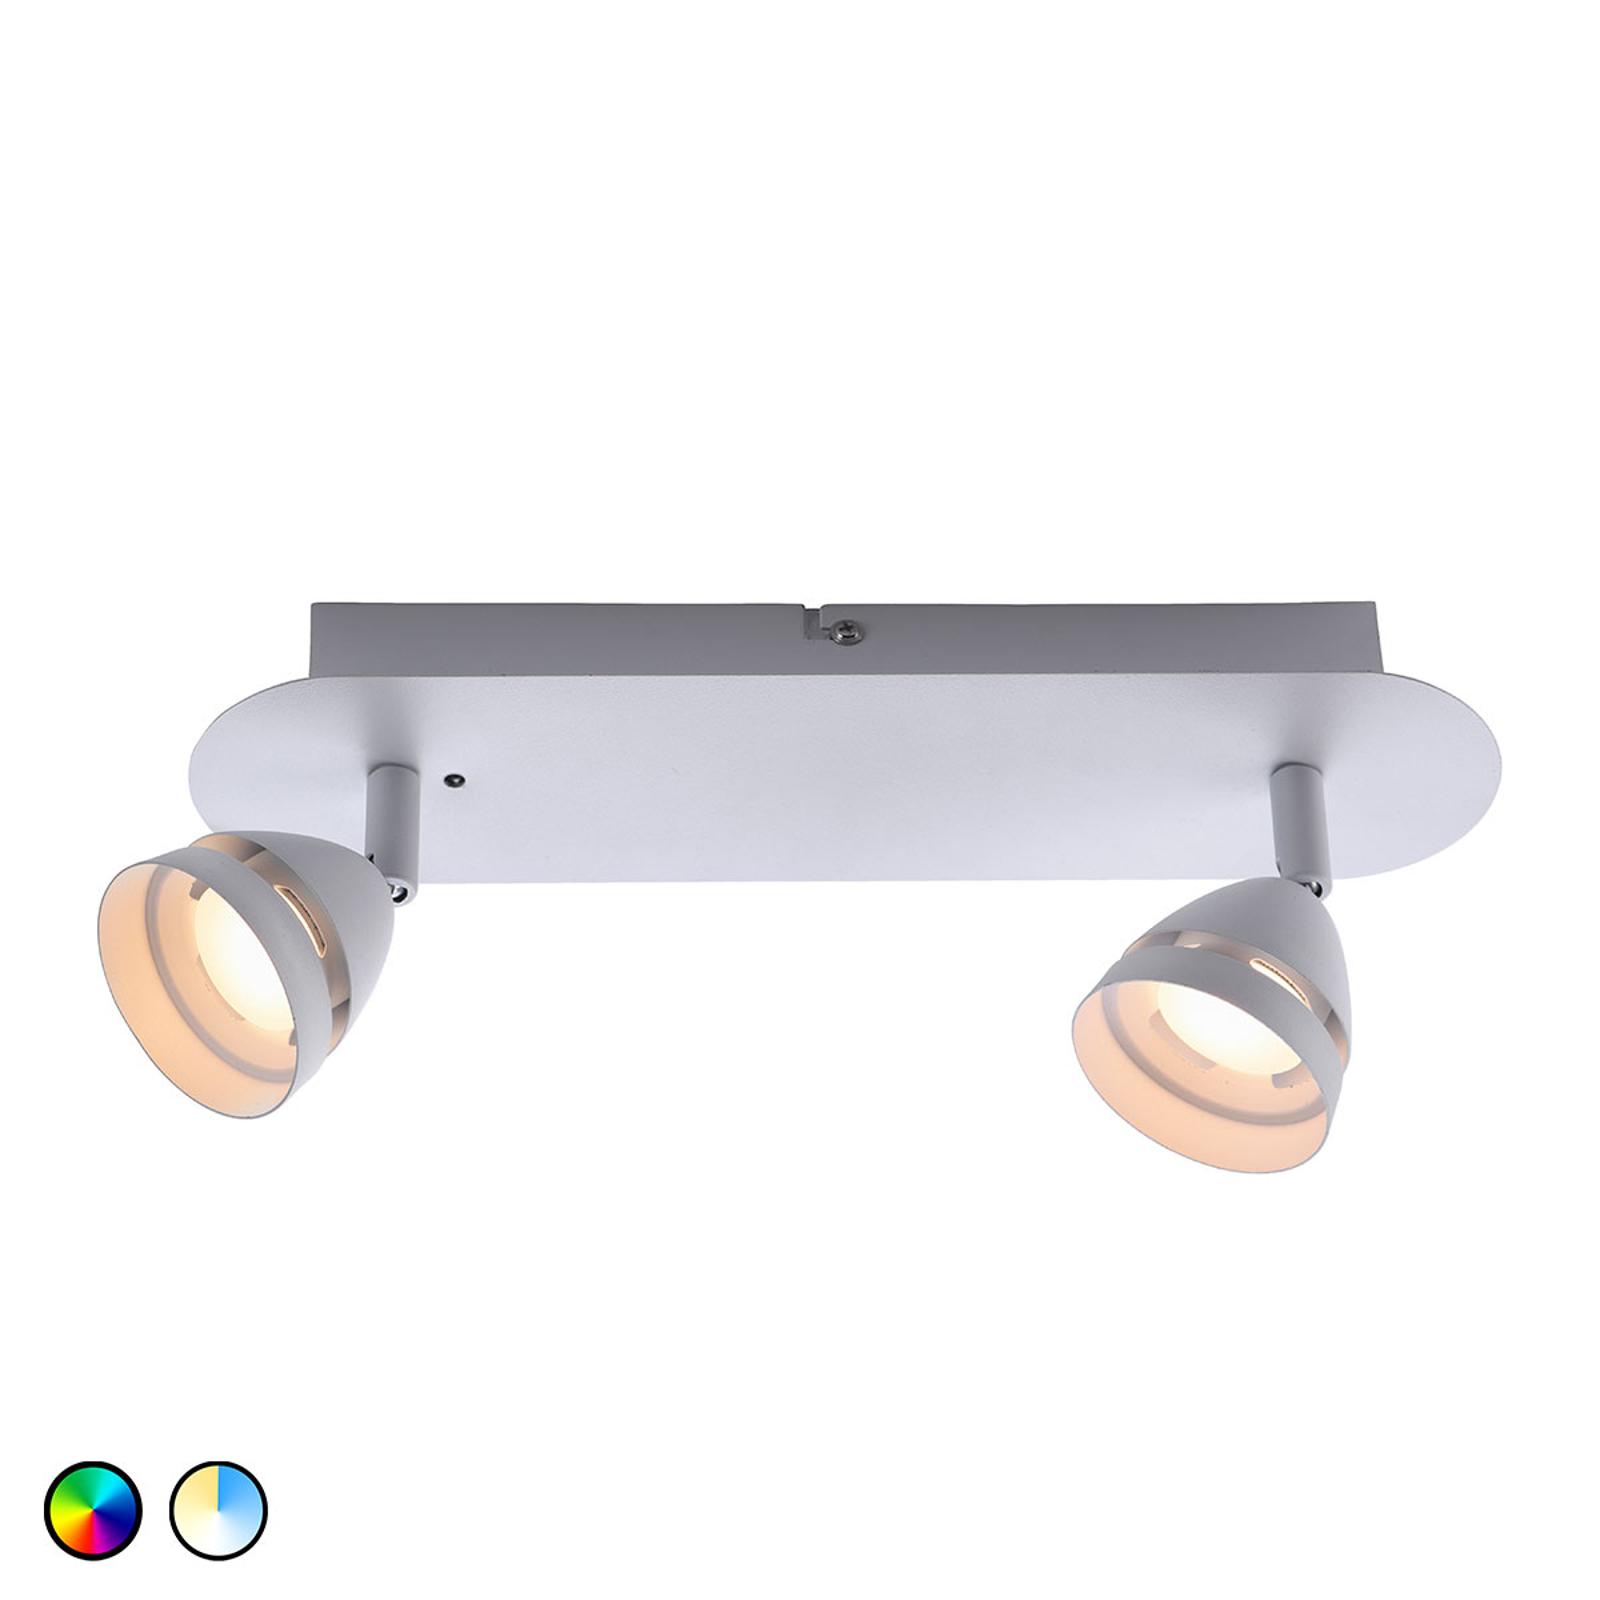 Trio WiZ Gemini -LED-kattovalaisin 2-lamppuinen